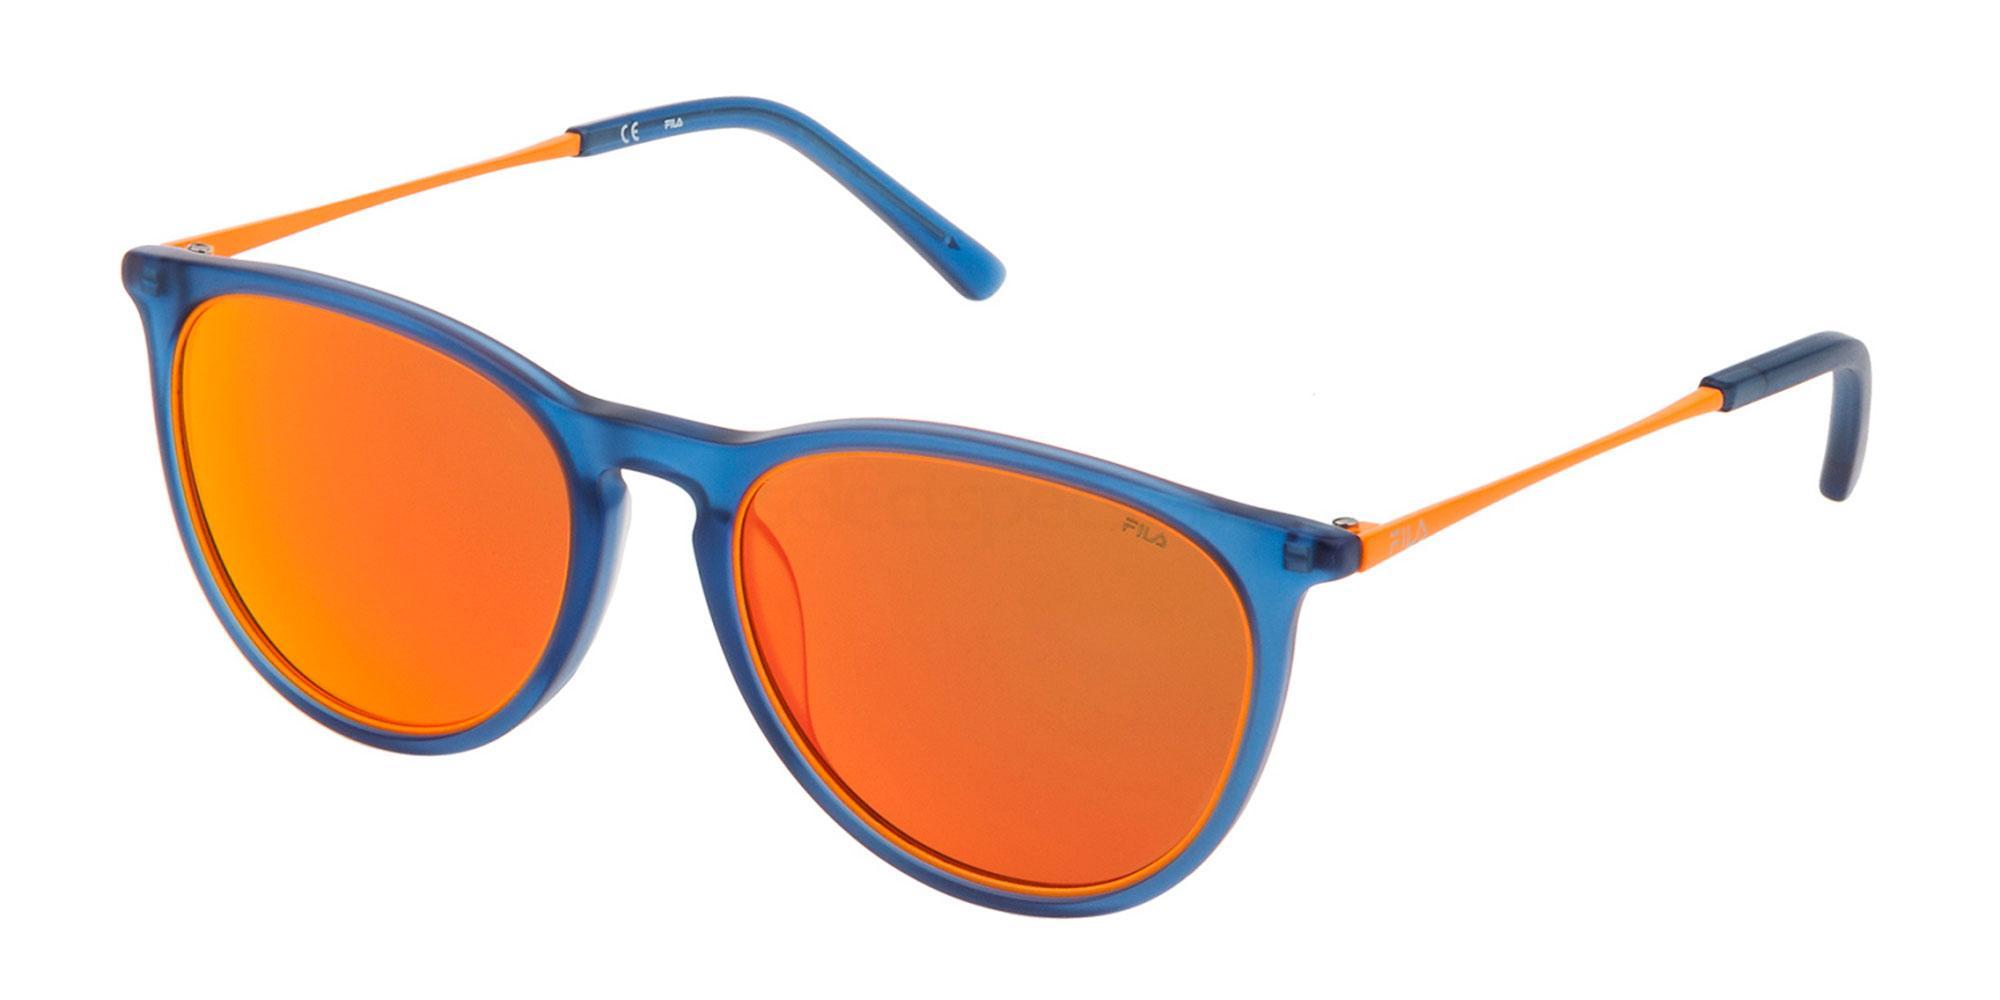 955R SF9246 Sunglasses, Fila